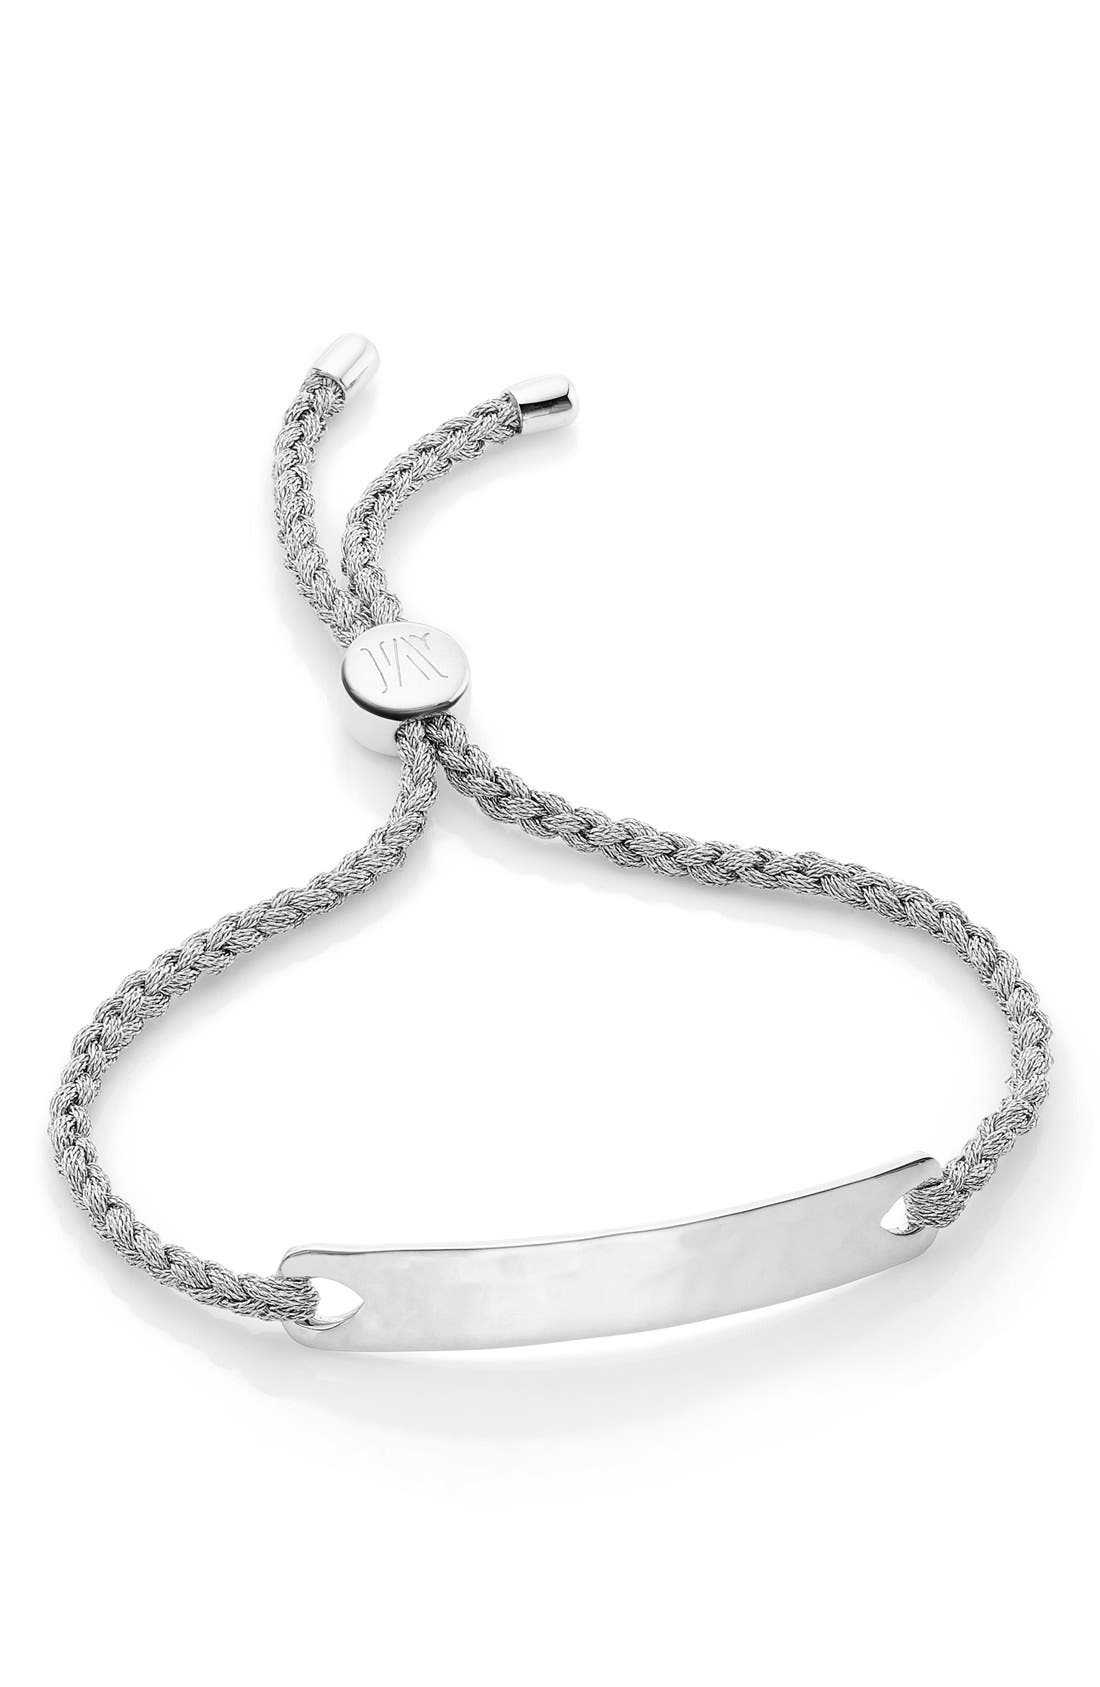 Alternate Image 1 Selected - Monica VinaderHavanaFriendship Bracelet